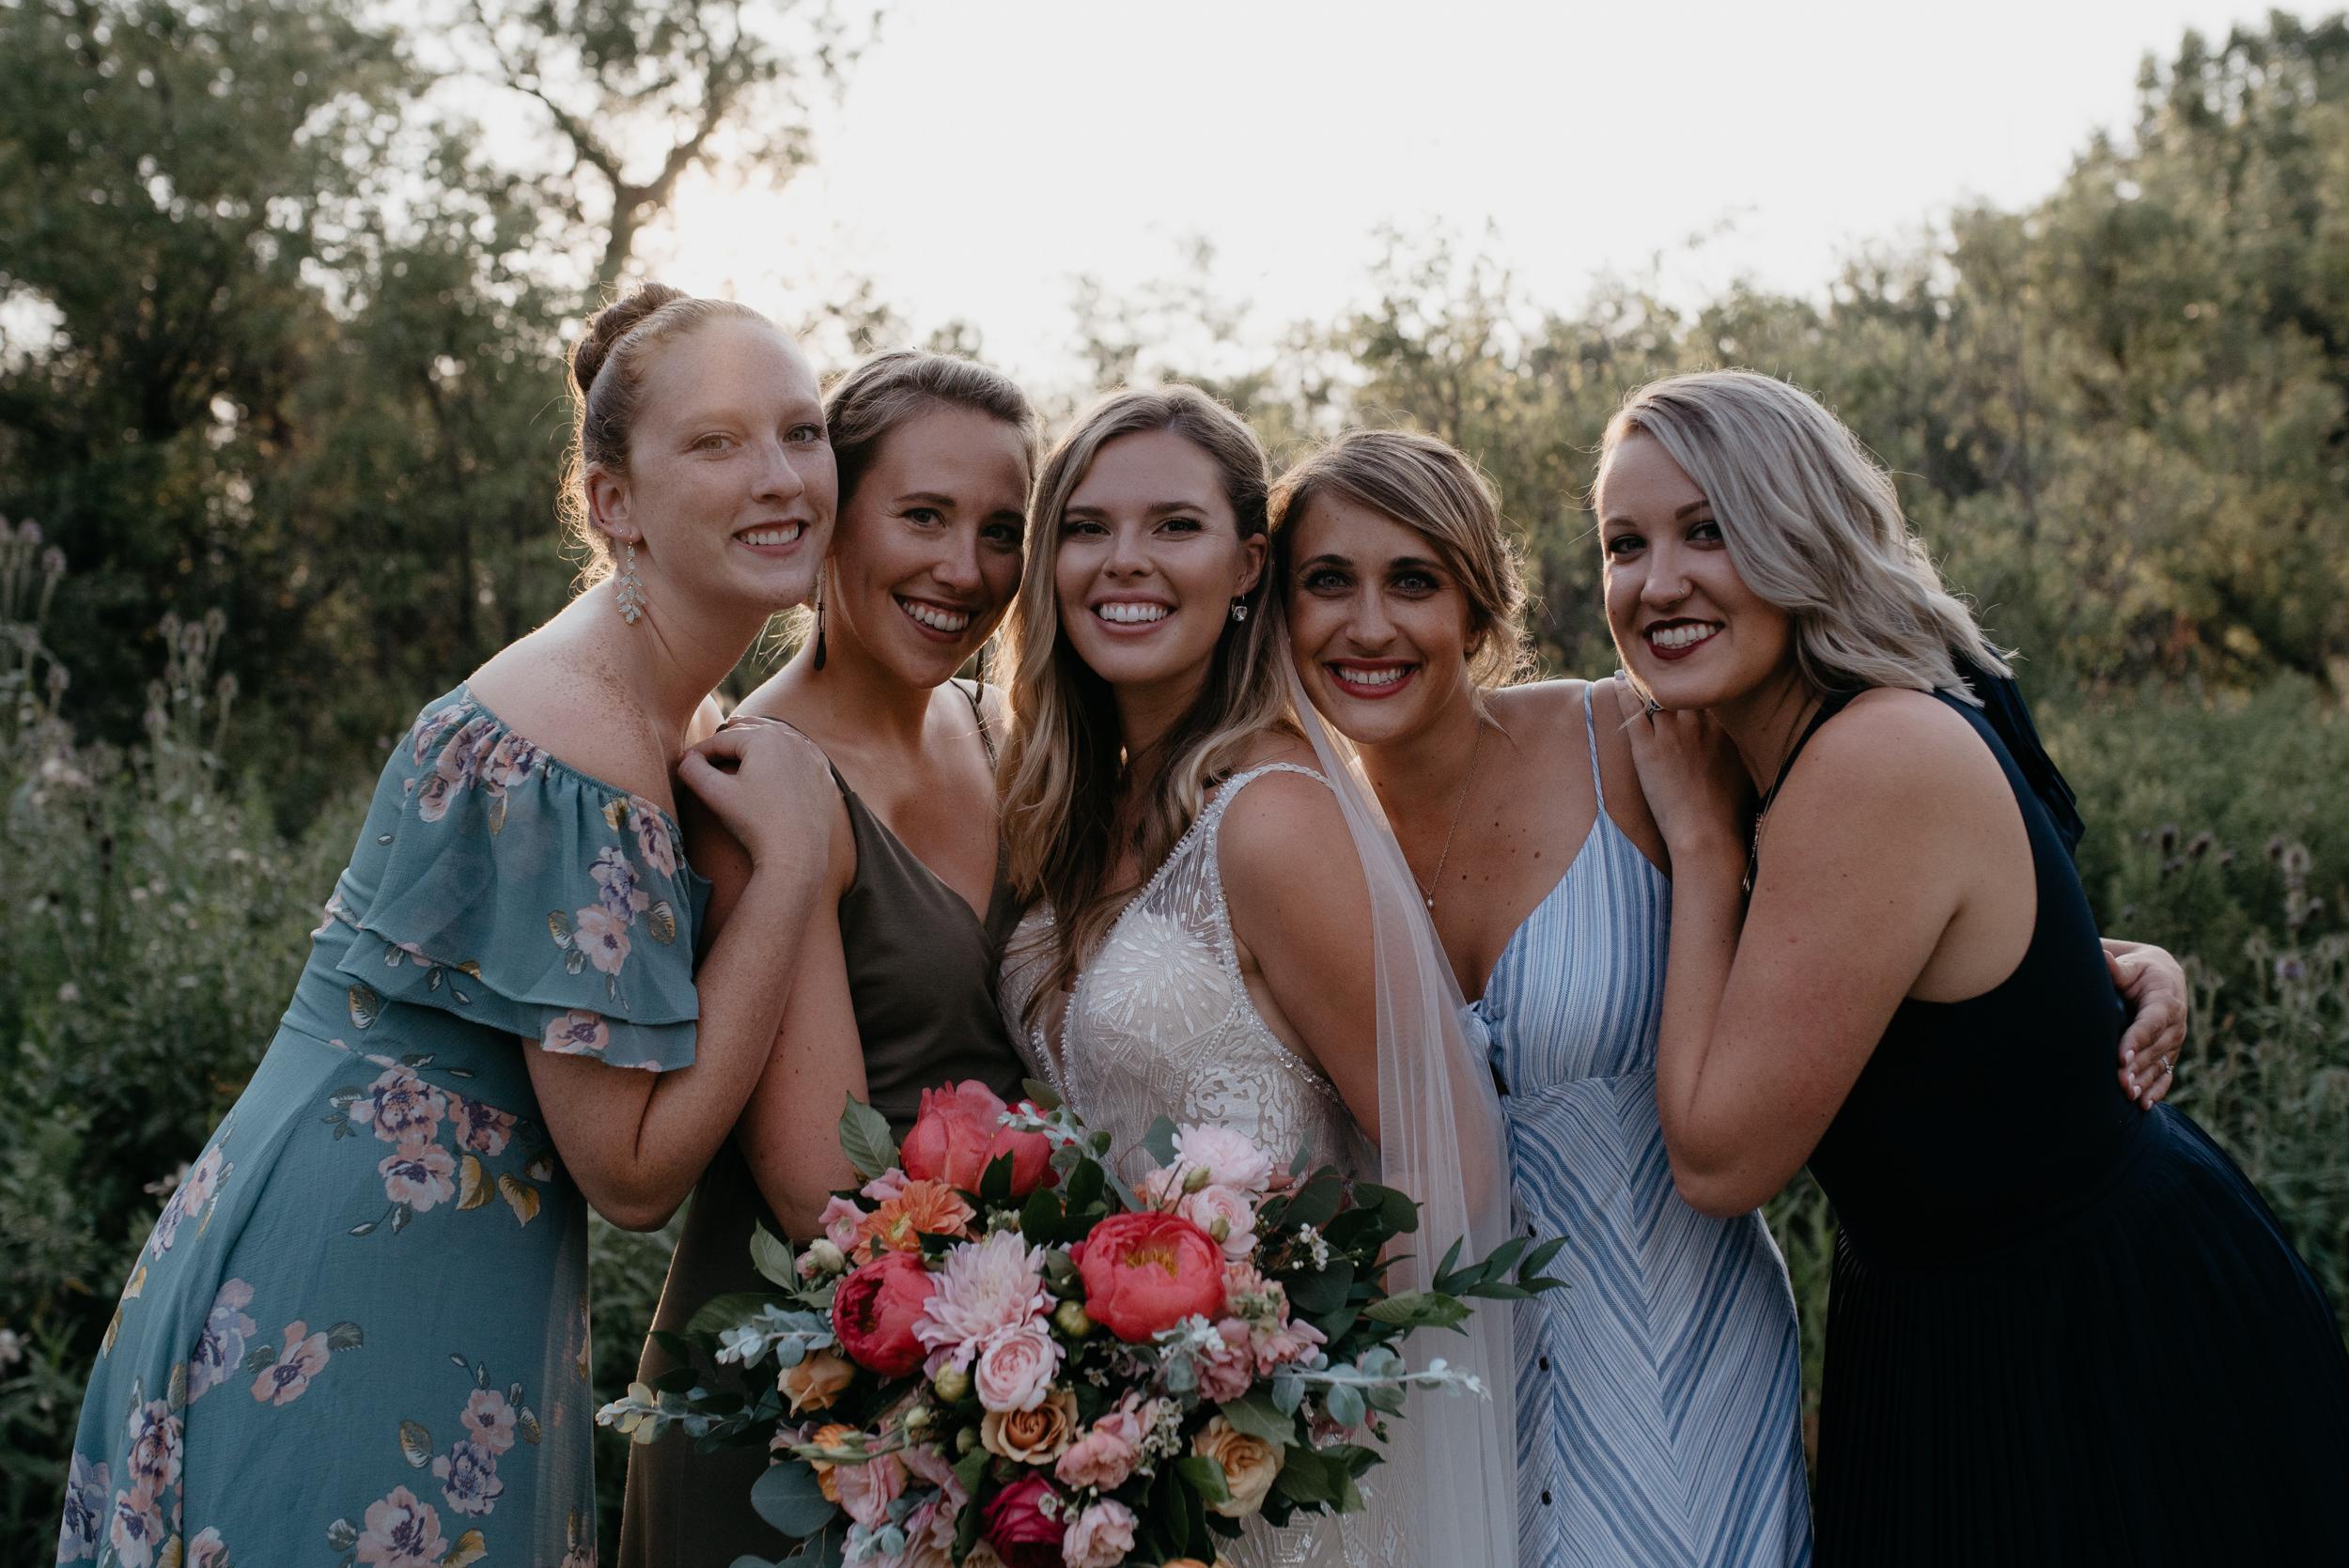 Bridesmaids at Boulder, Colorado wedding. Colorado wedding and elopement photographer.